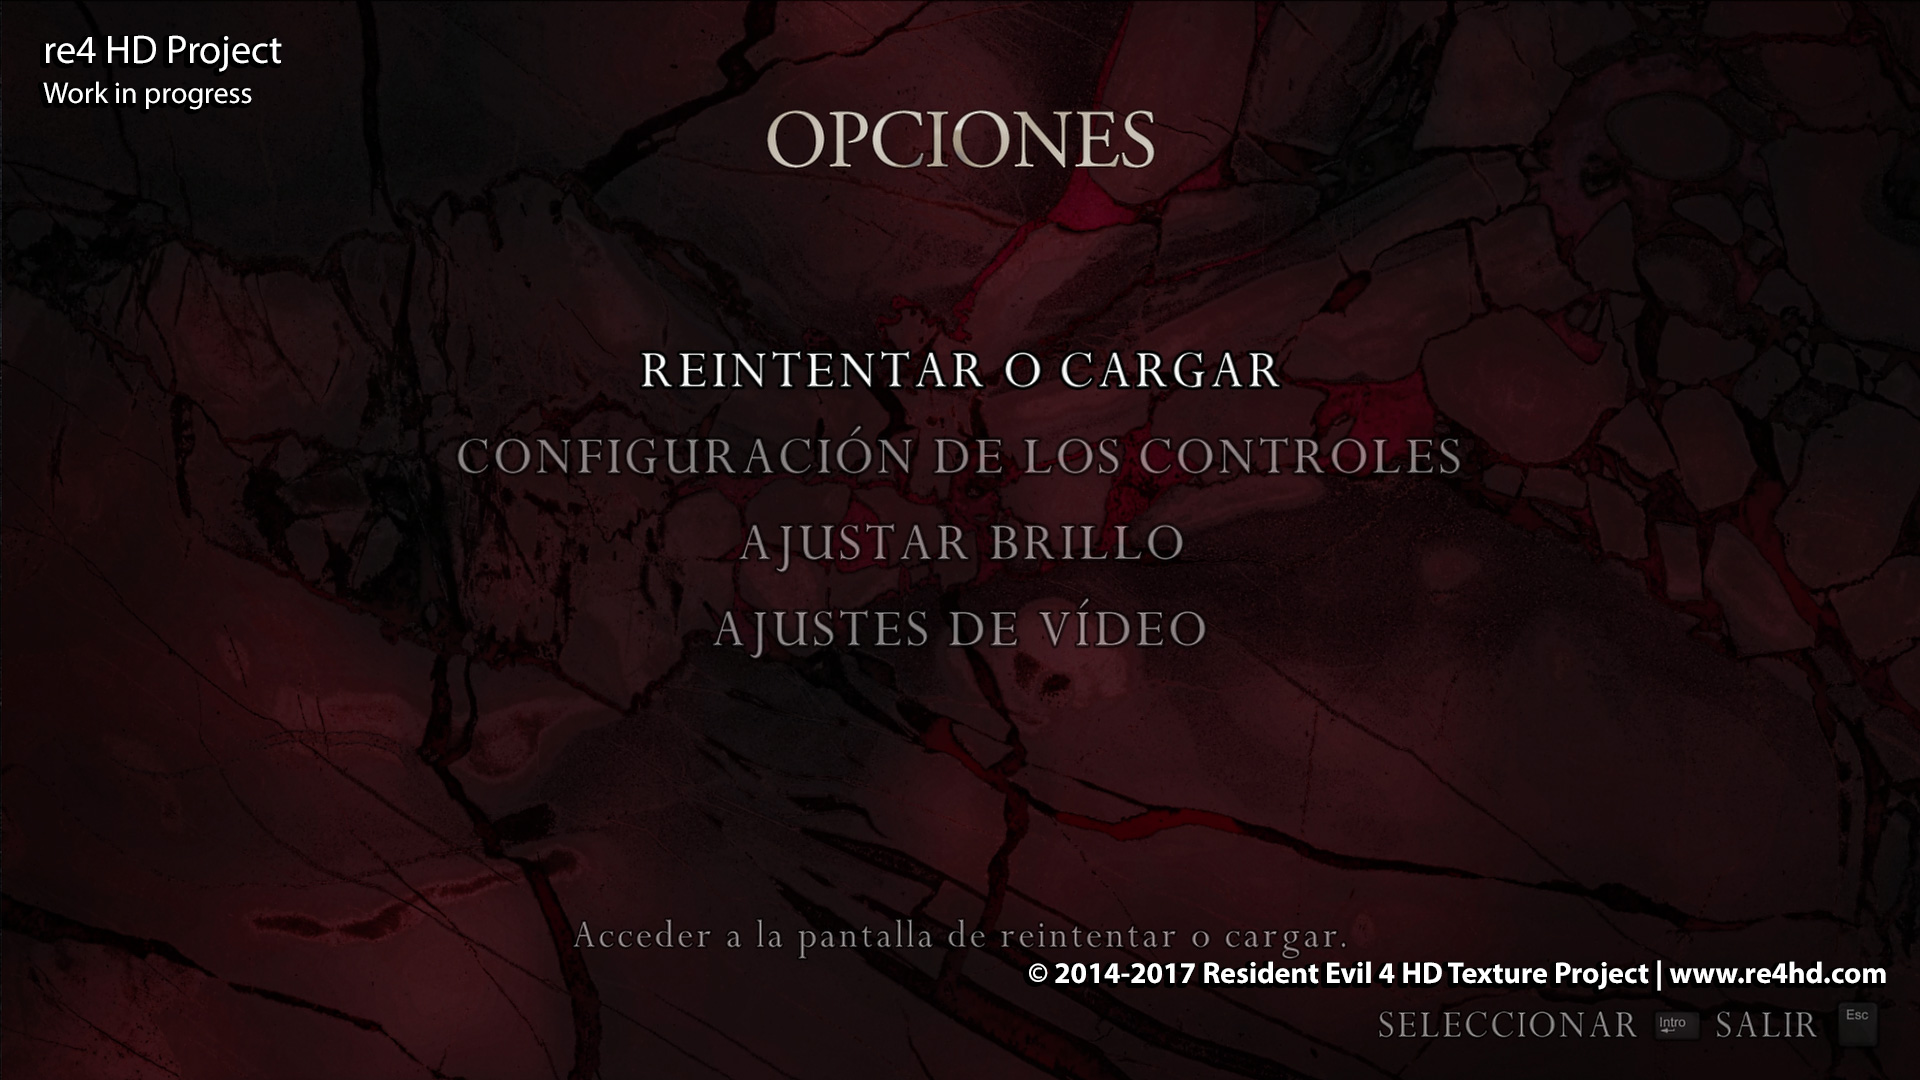 Sub Screens HD Remaster Resident Evil 4 HD Project 1920x1080